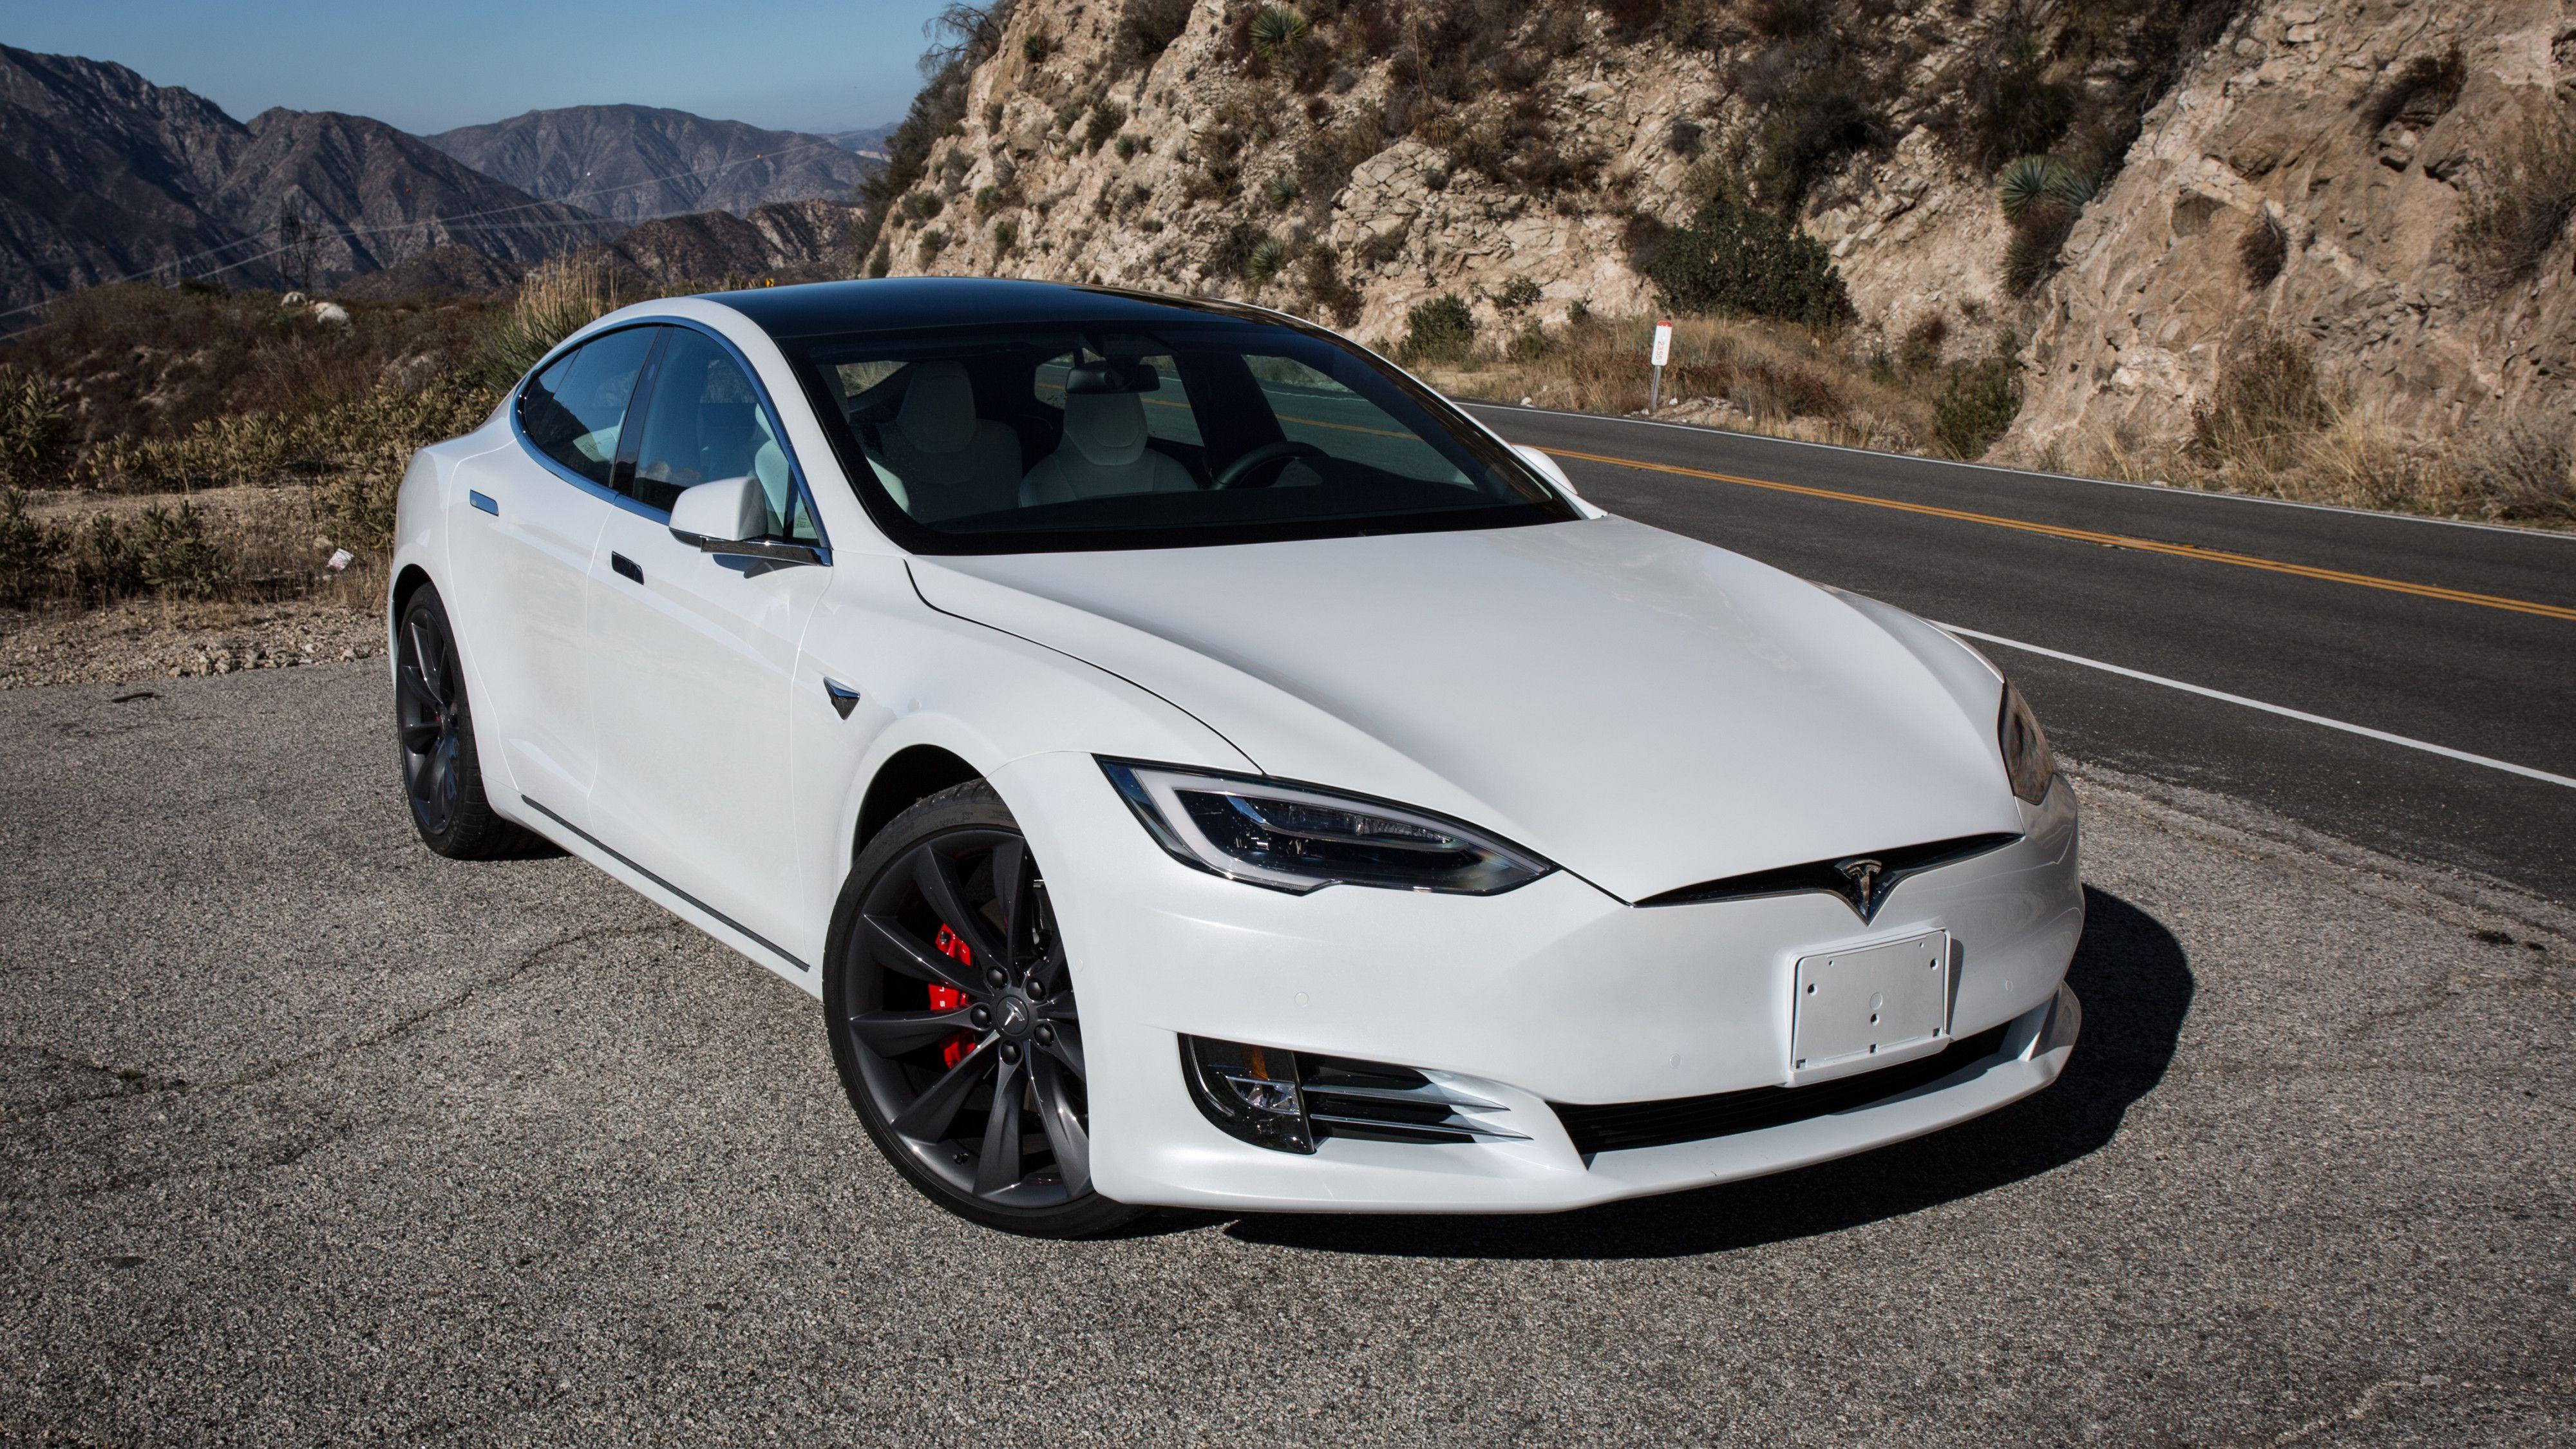 First Drive Tesla Model S P100d Tesla Model S Tesla Motors Model S Tesla Model